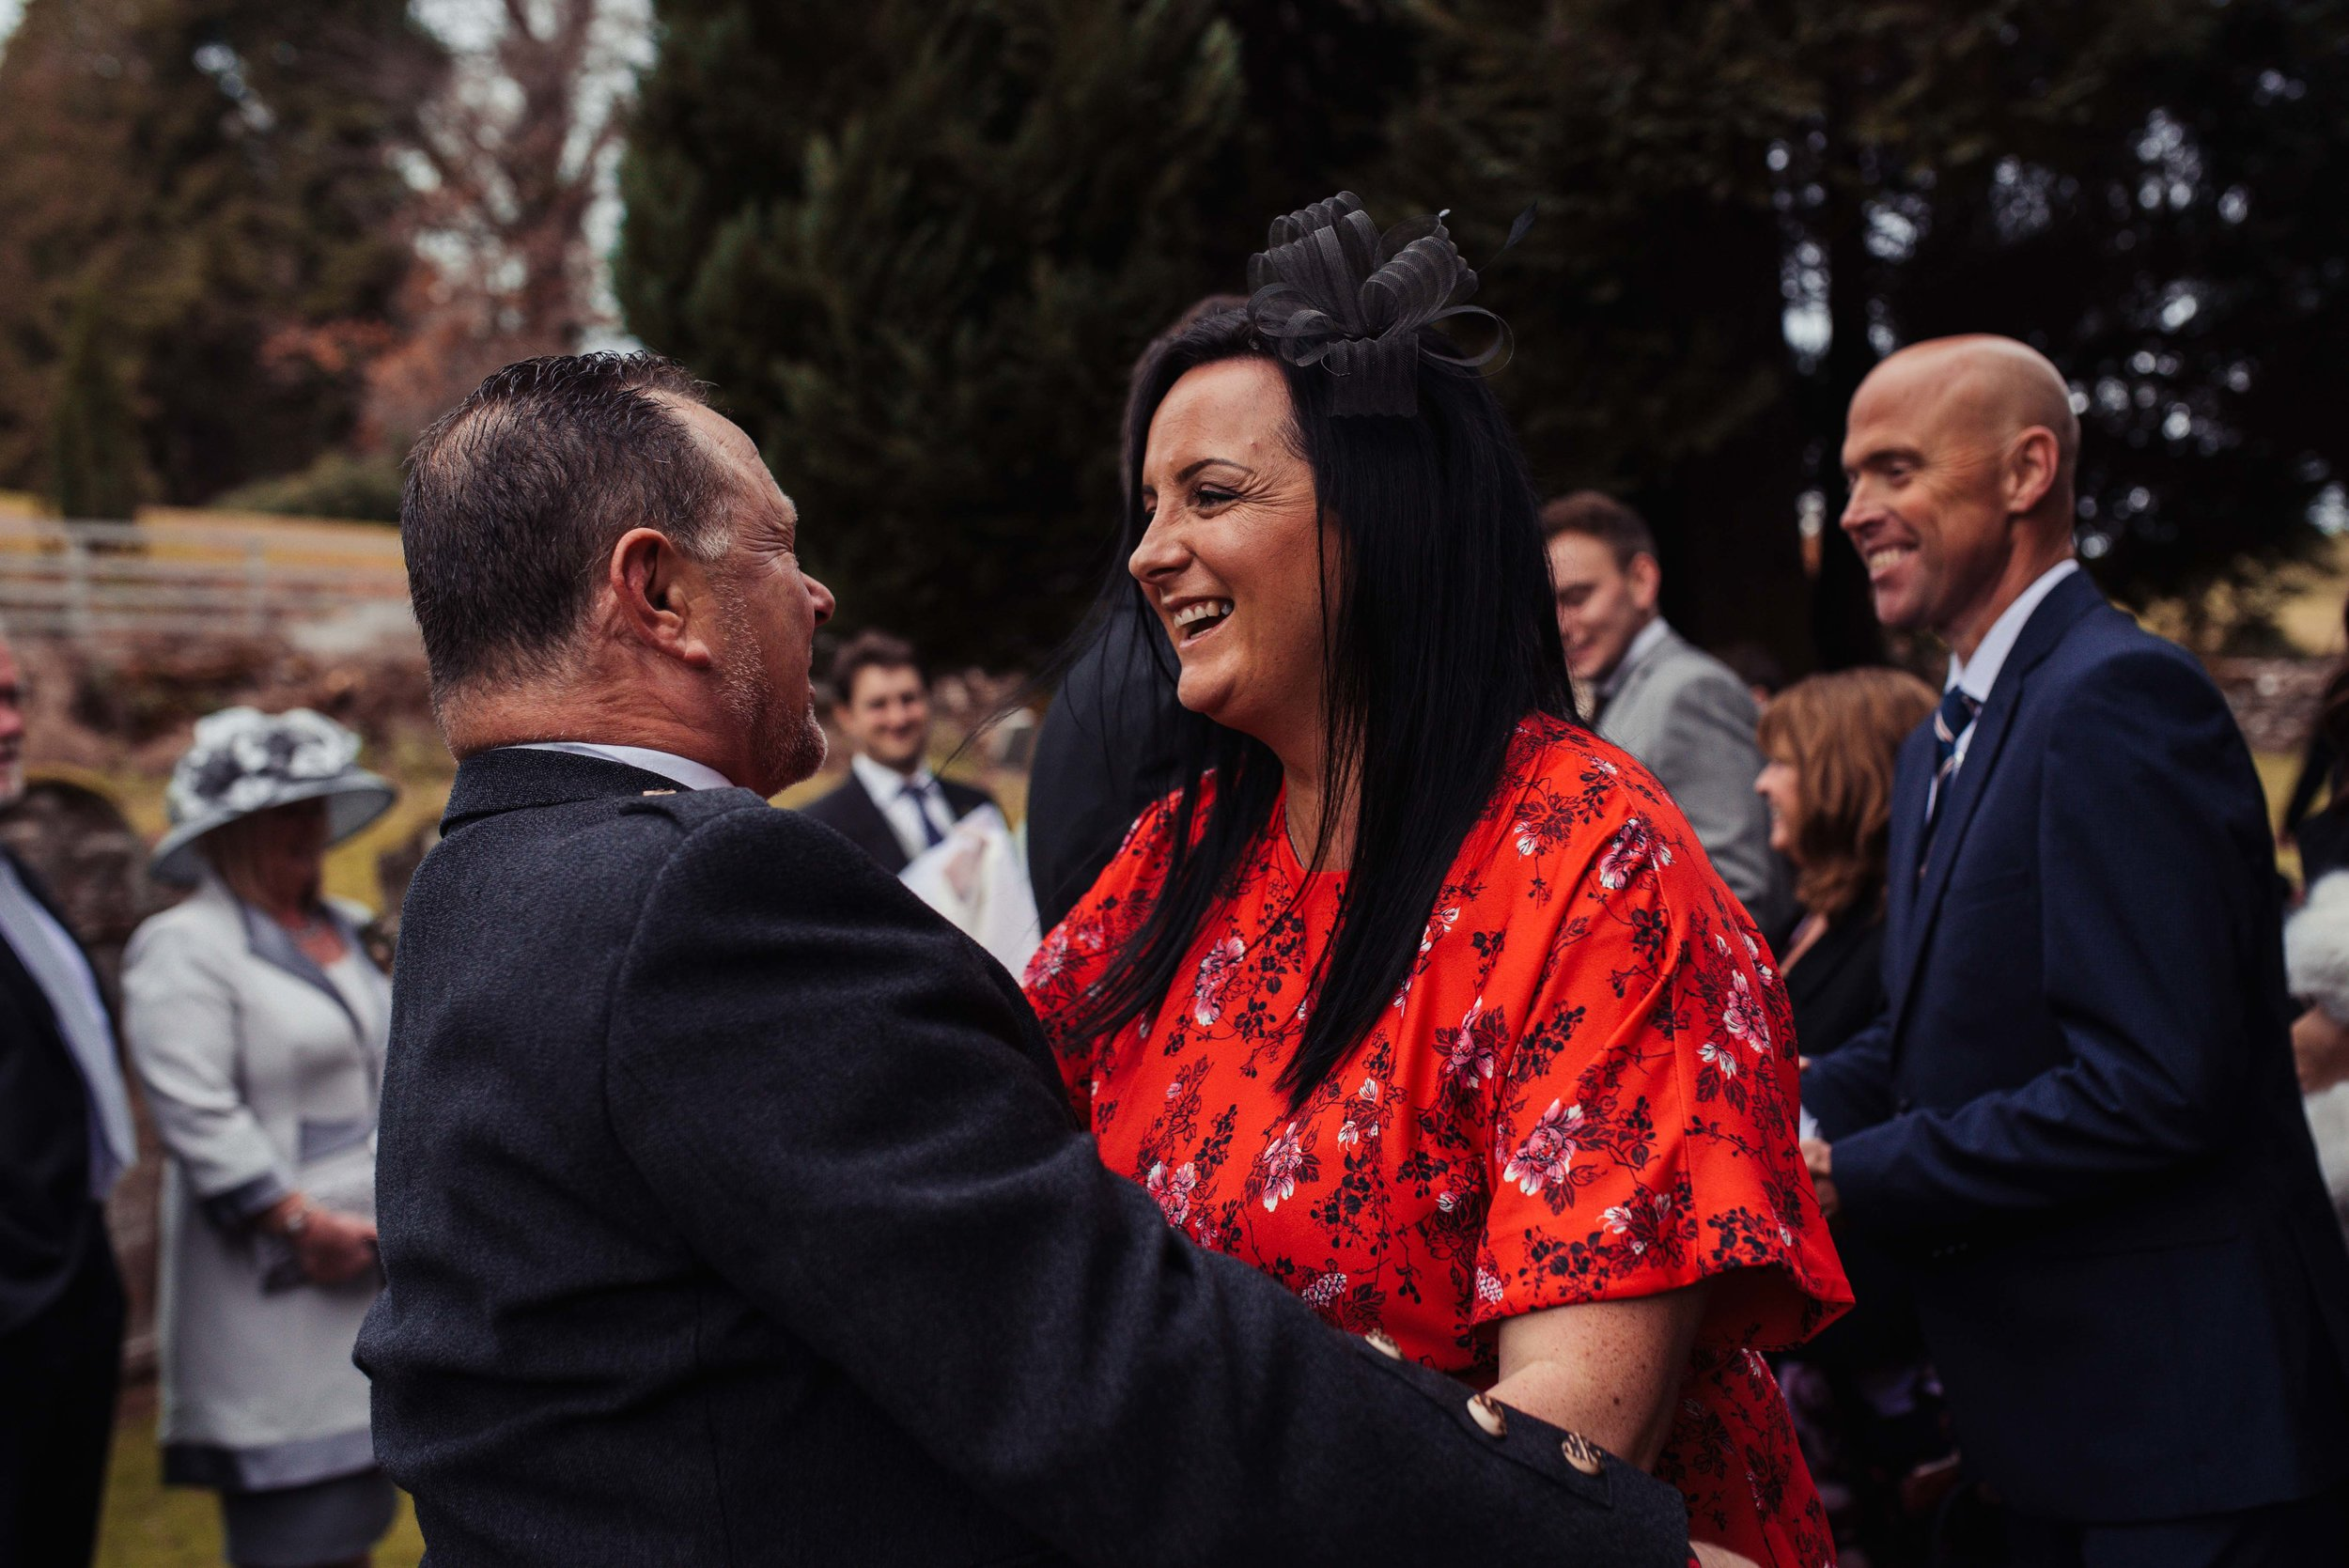 Askham-Hall-Wedding-Photography-35.jpg